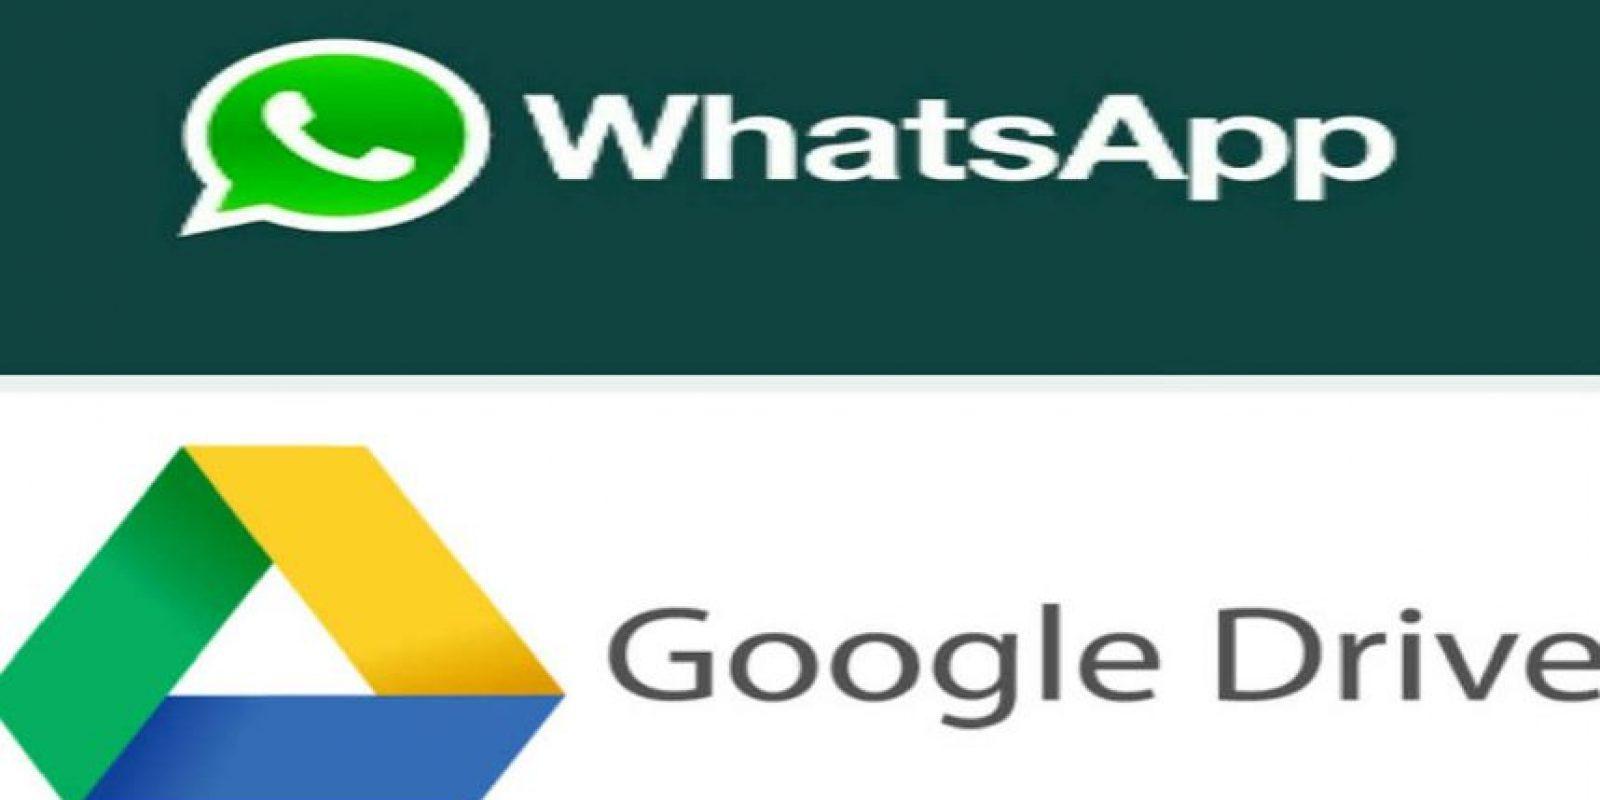 Google Drive es un servicio de la nube. Foto:WhatsApp/ Google Drive